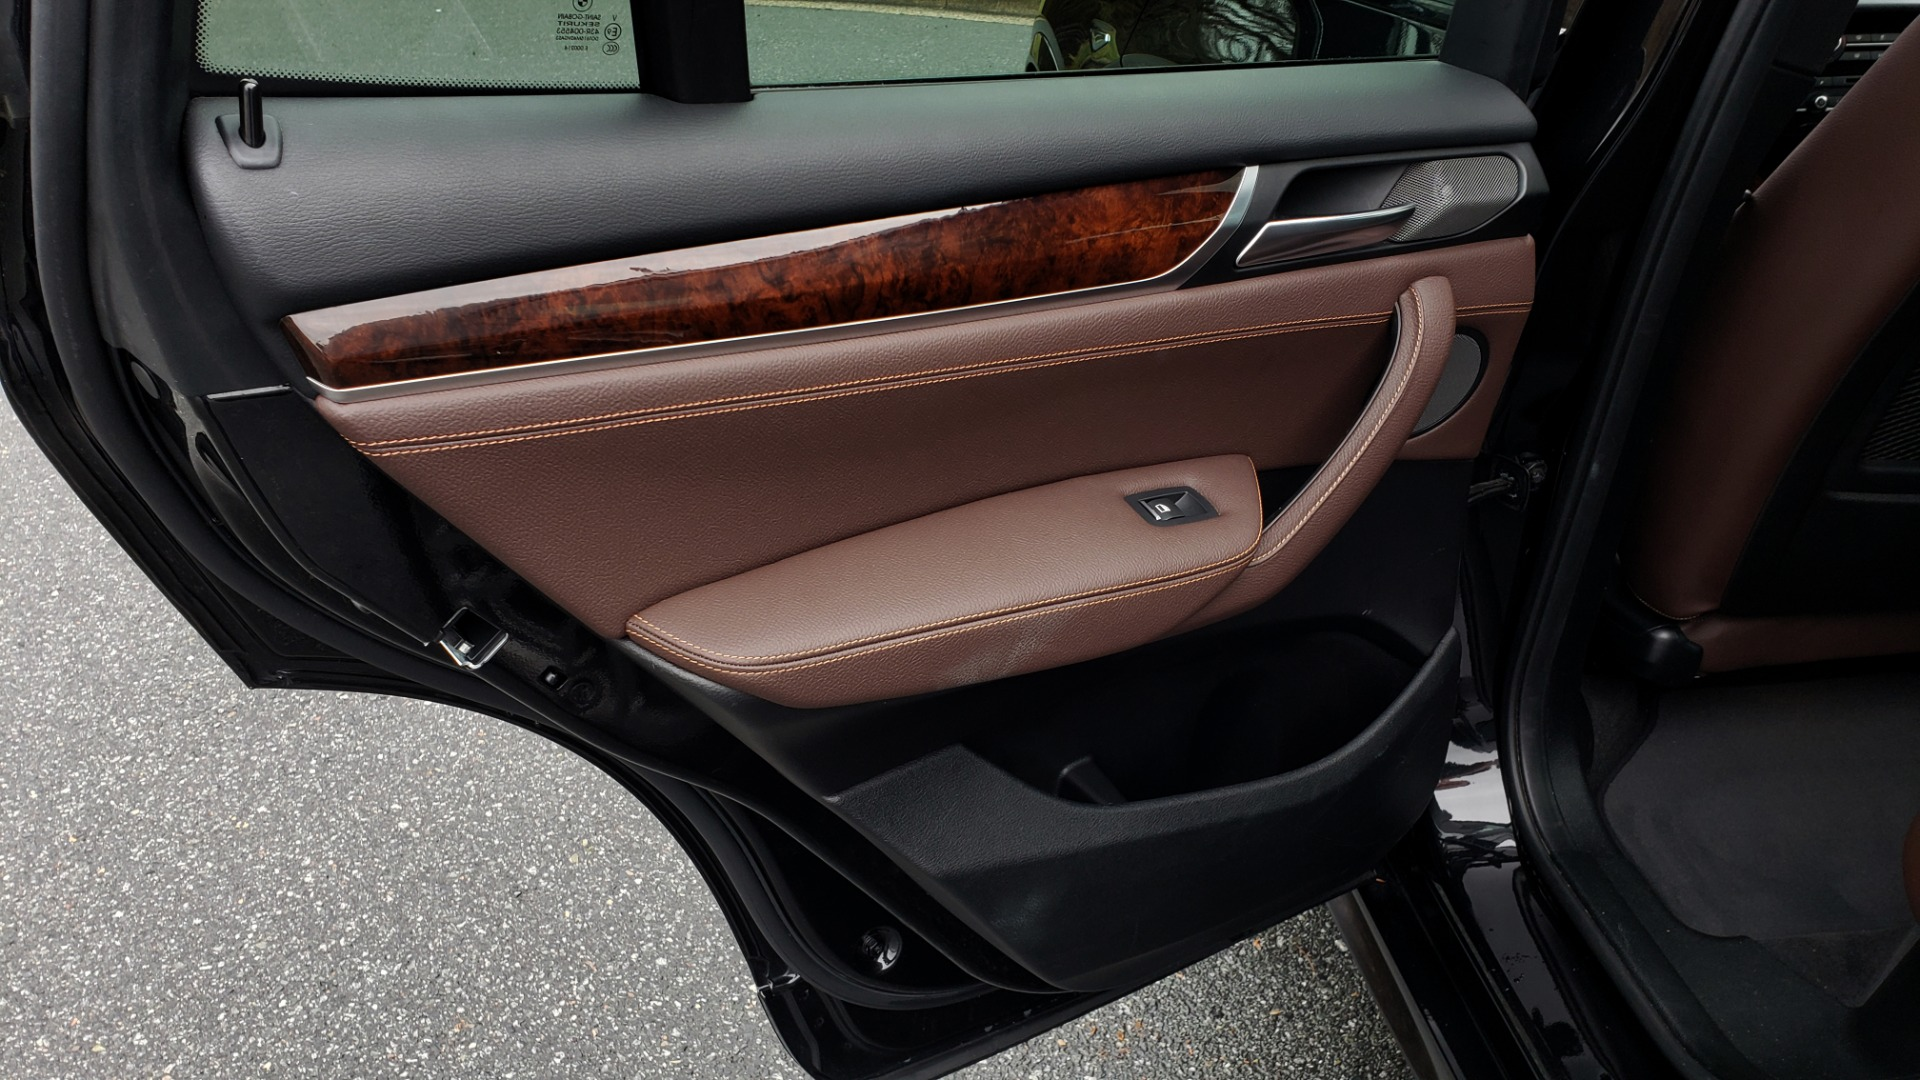 Used 2017 BMW X3 XDRIVE35I M-SPORT / DRVR ASST PLUS / TECHNOLOGY / HUD / BLIND SPOT for sale Sold at Formula Imports in Charlotte NC 28227 58